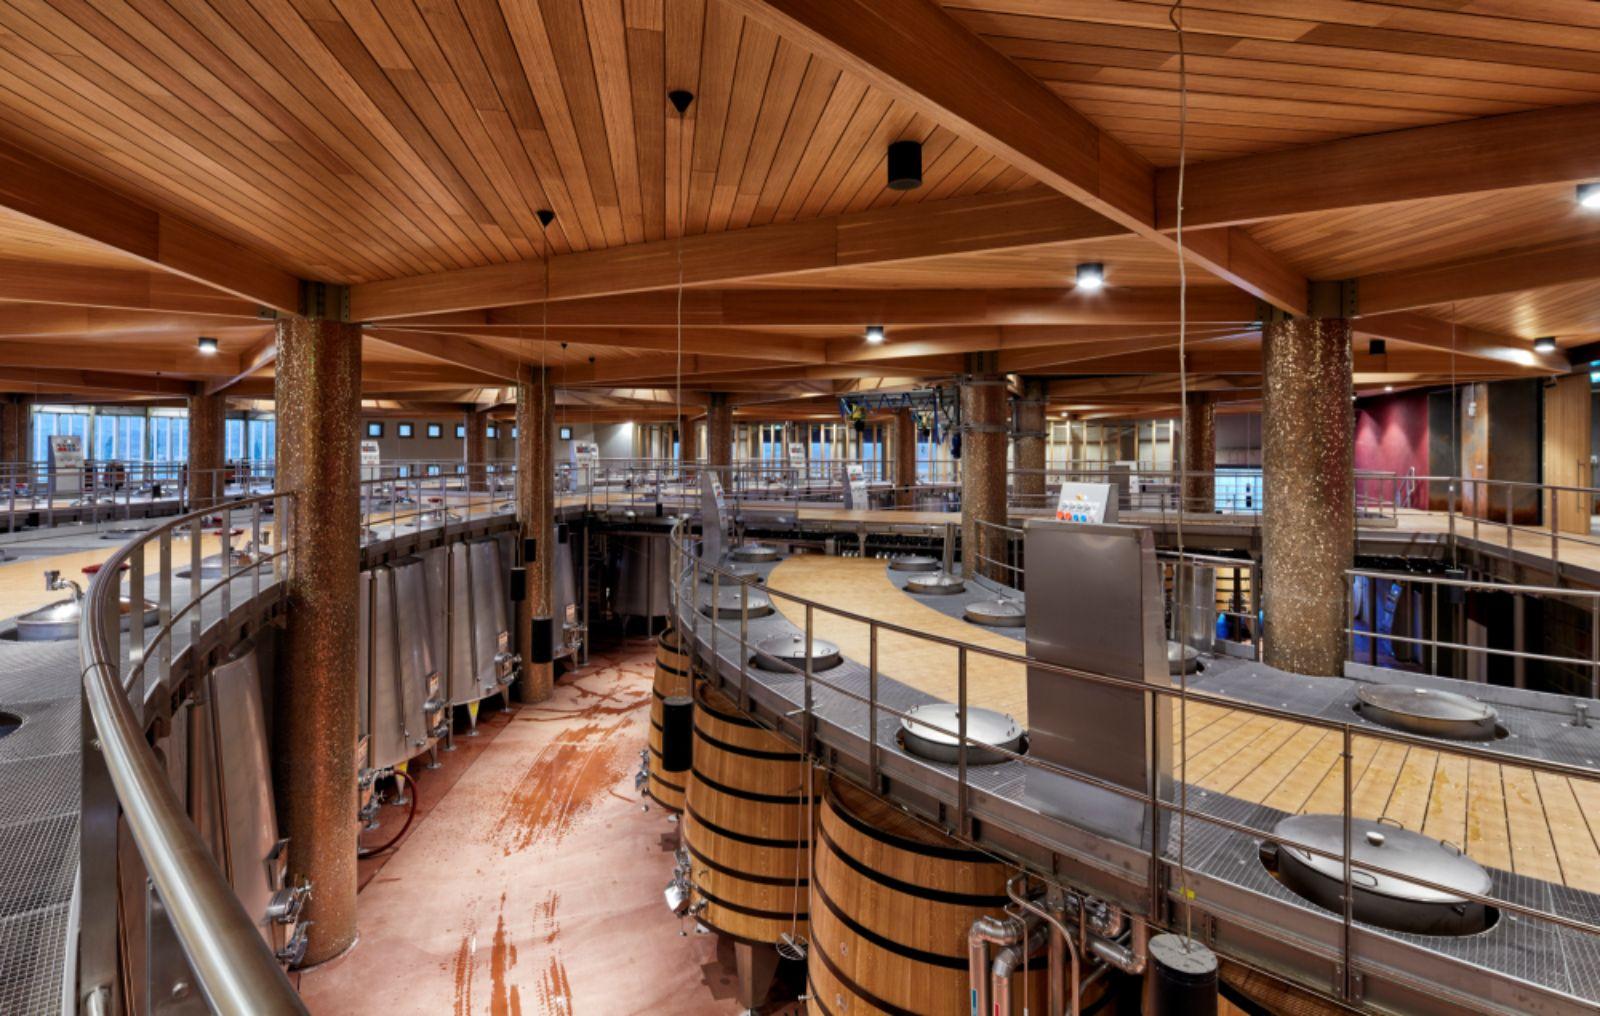 Vinero Winery and Hotel